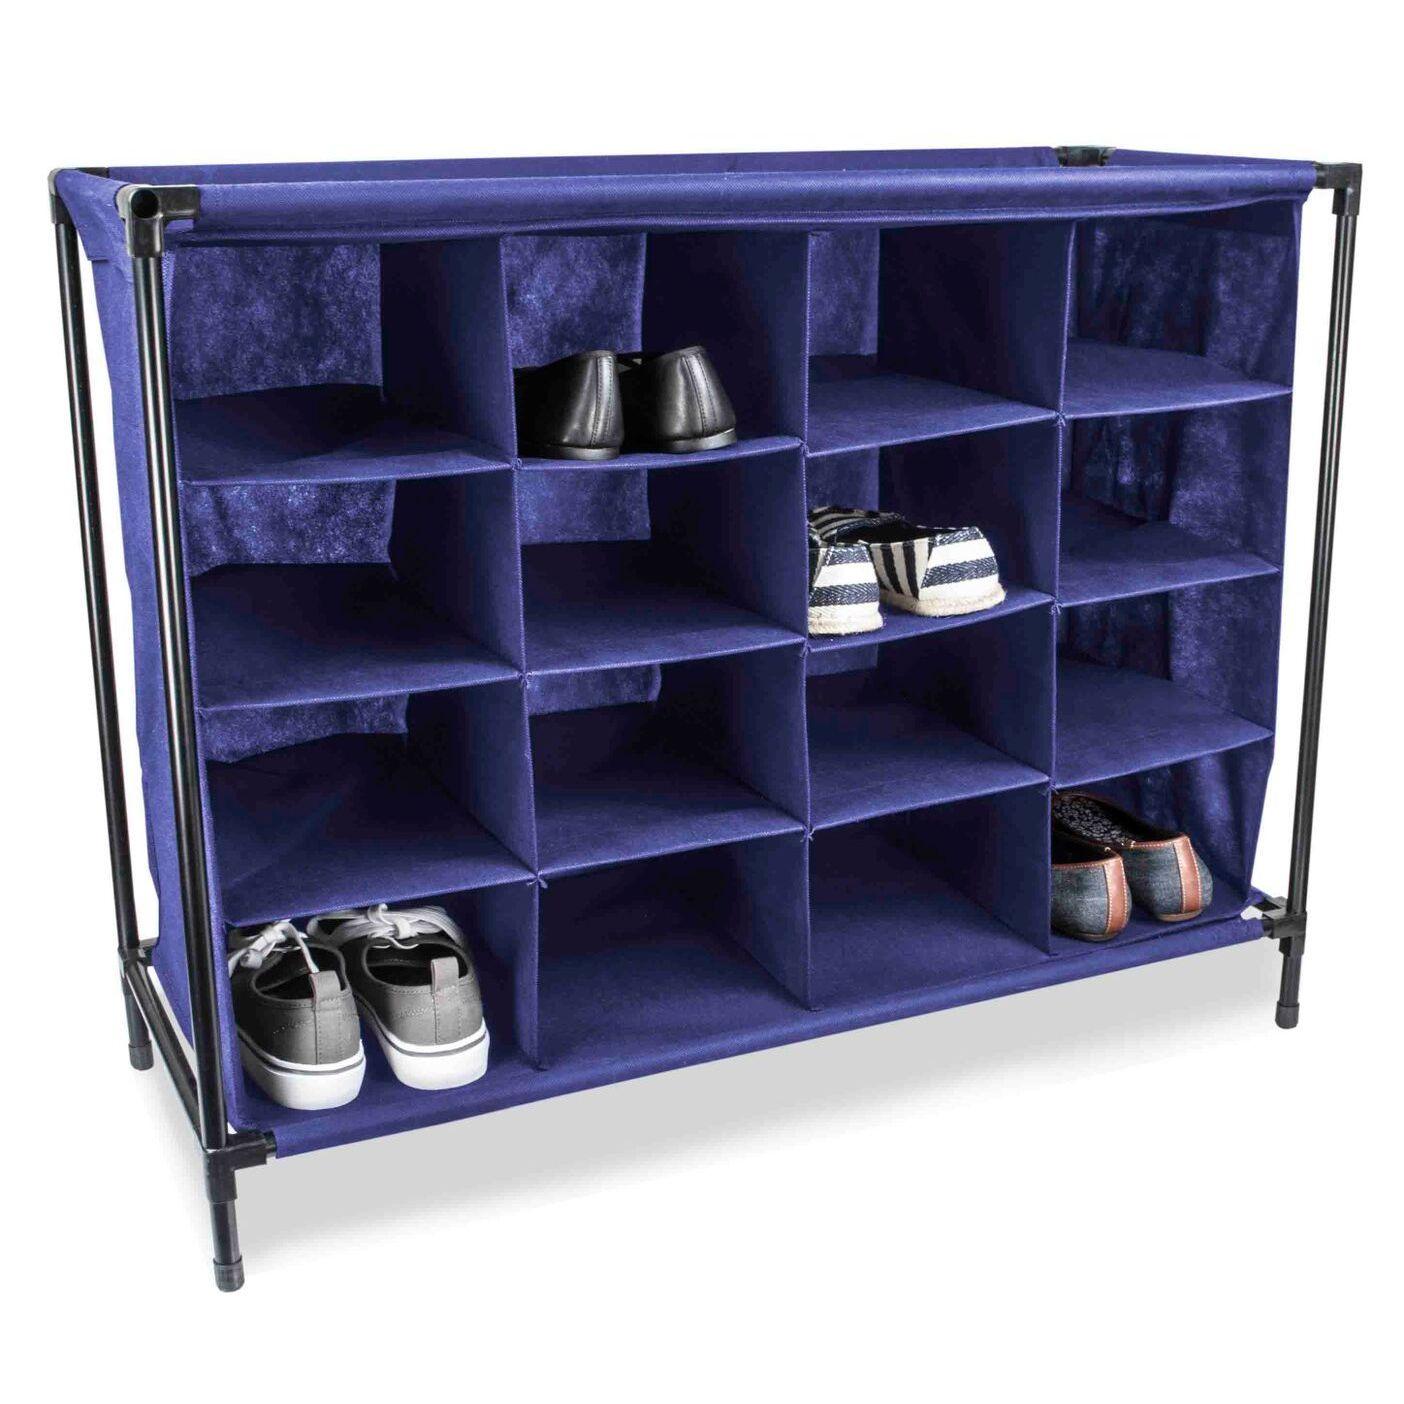 Sunbeam 16-Compartment Cubby Shoe Rack (Blue) (Plastic)